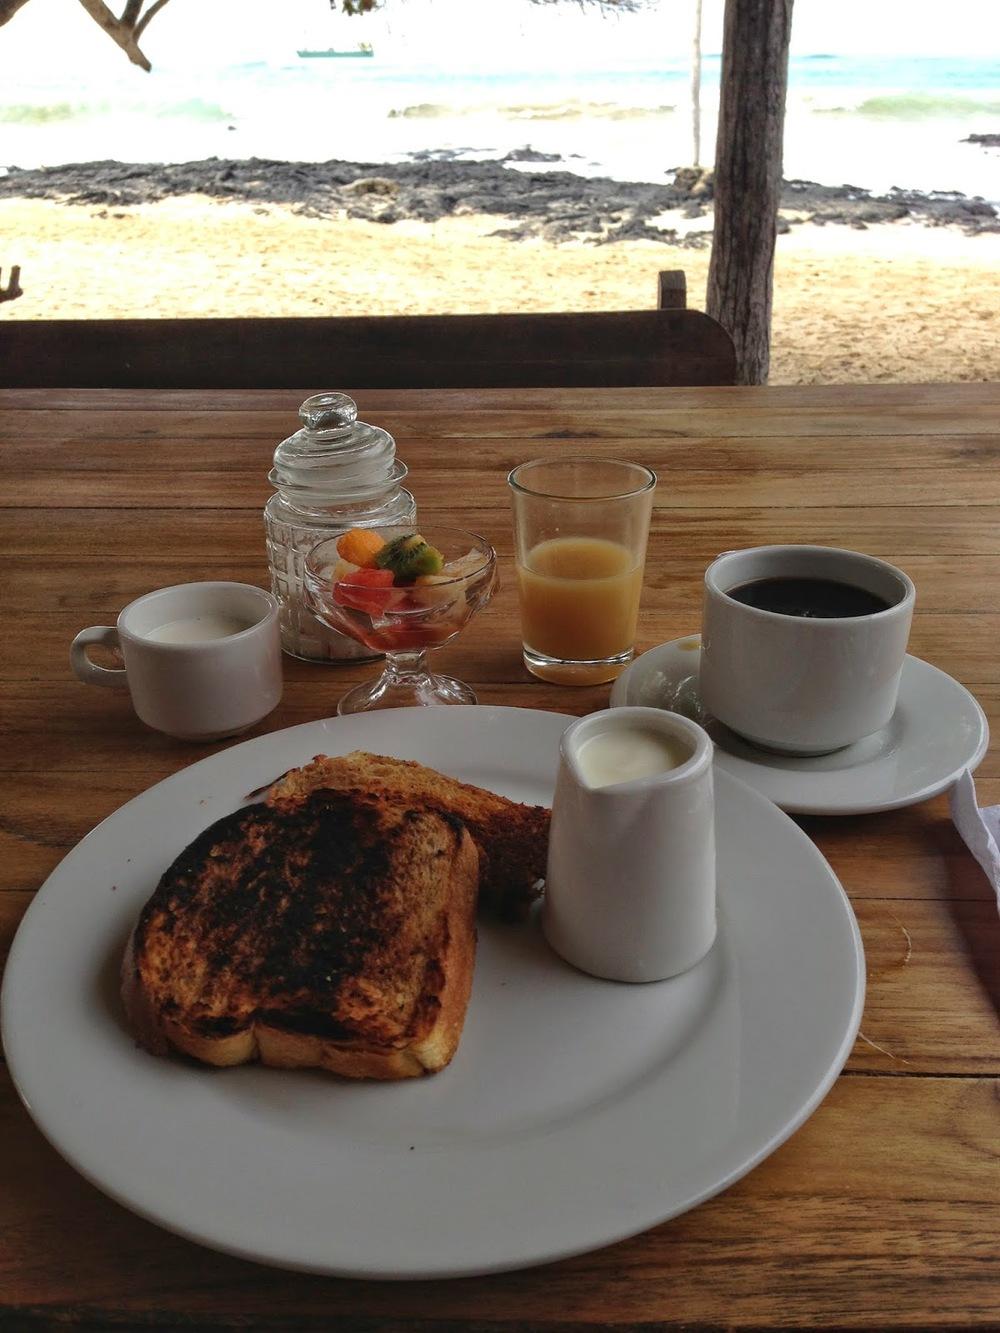 On the menu this morning: French toast, fruit cup, yogurt and honey, fresh papaya juice, and coffee. Delish.